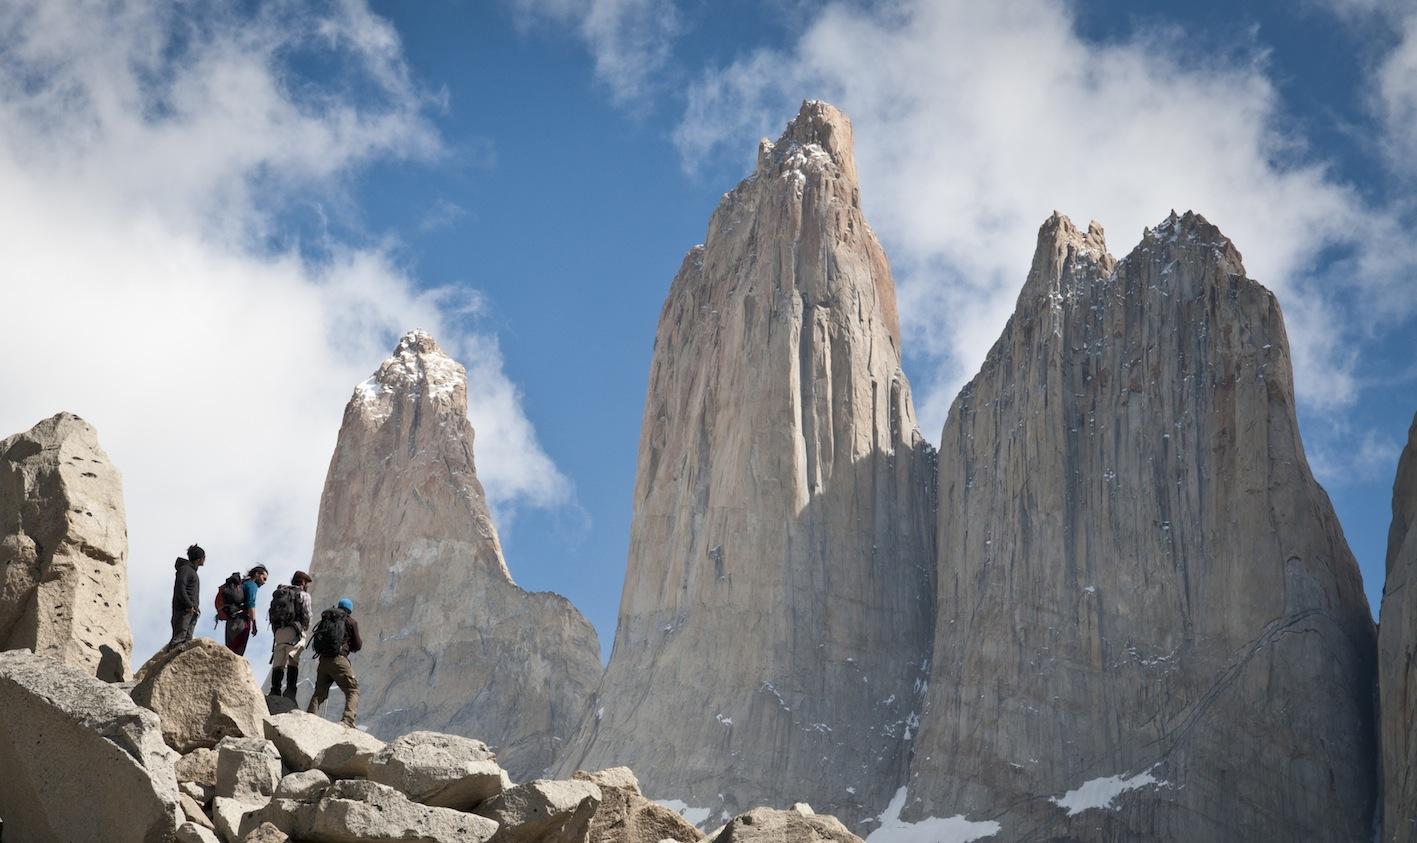 Buenos Aires El Calafate Argentina For Adventurers 21 Days Trip